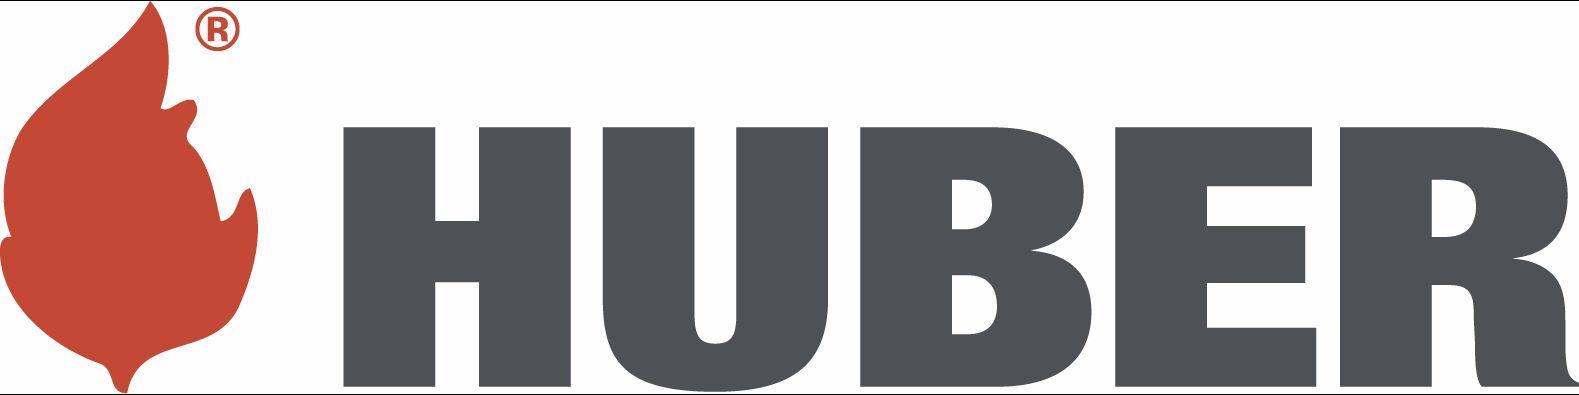 Huber_GmbH.jpg